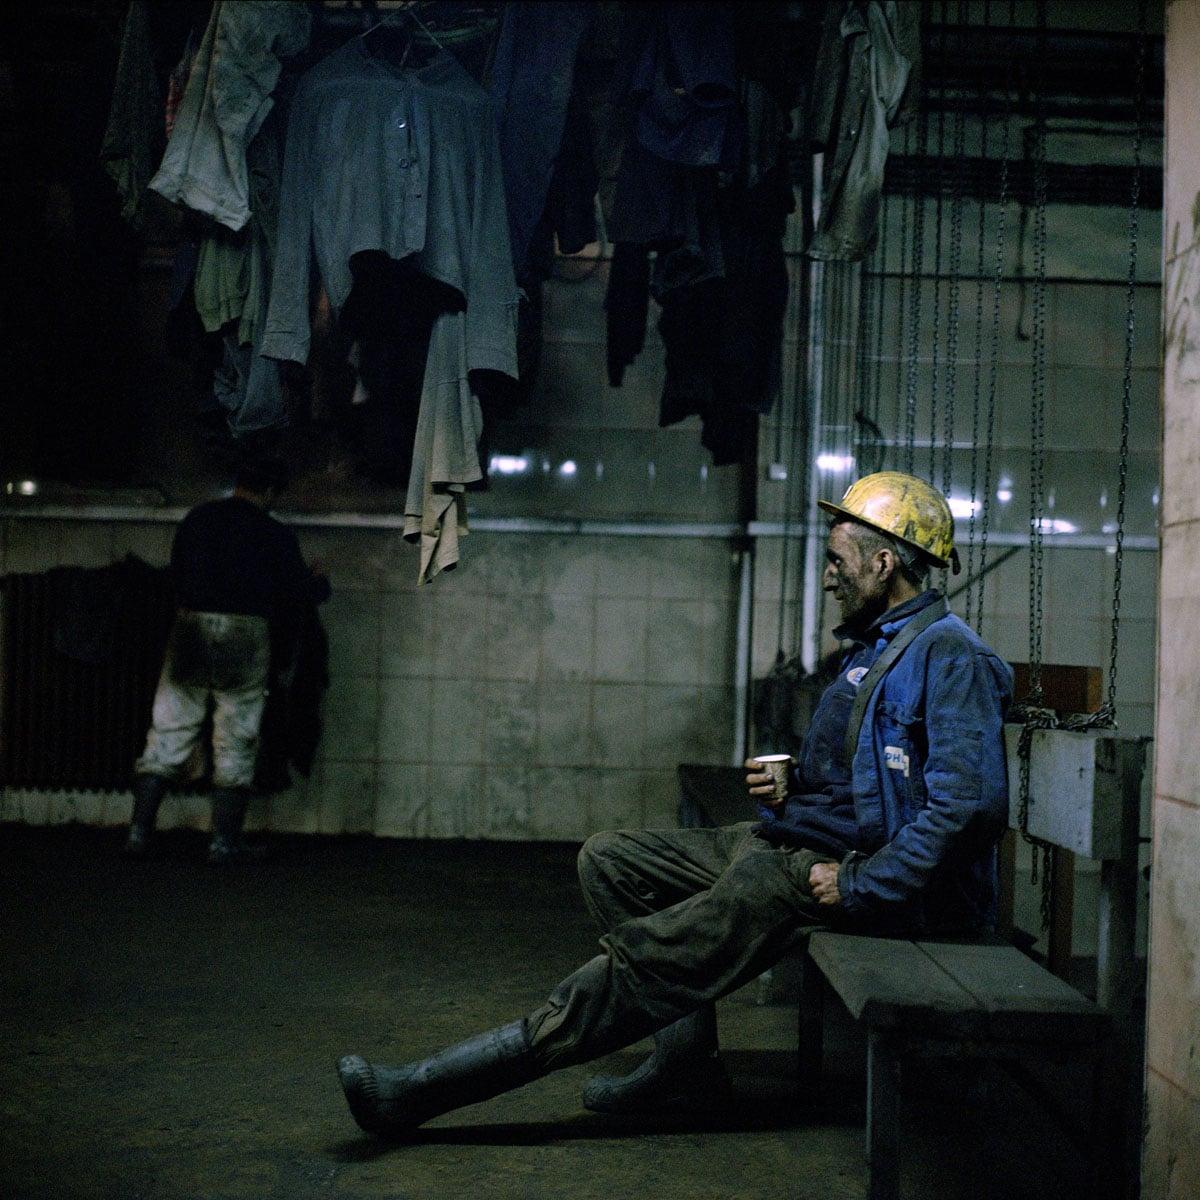 Turkey, Zonguldak, 16-01-2015 KARADON Coalmine, which is property of TTK in Kilimli-Zonguldak. Coalminers after the morning shift posing. PHOTO AND COPYRIGHT ROGER CREMERS